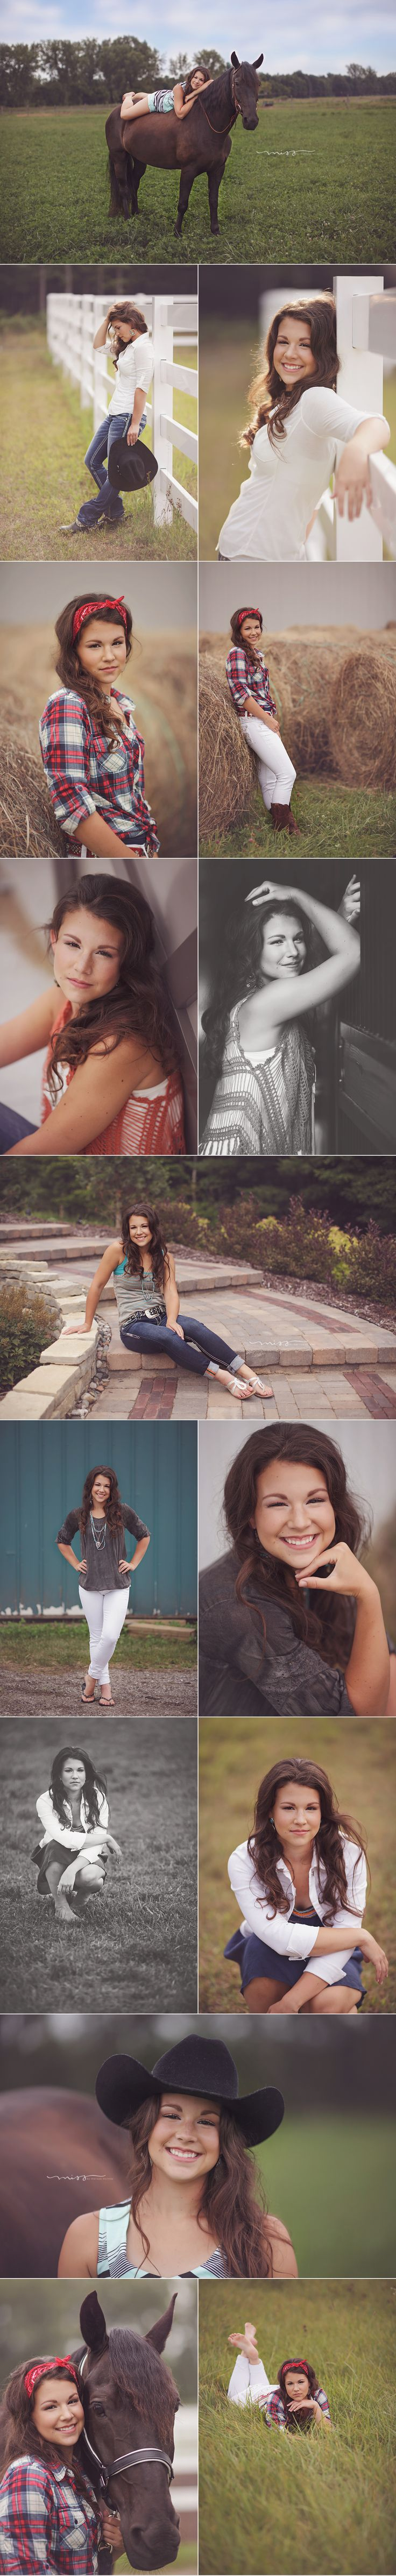 MidMichigan Senior Photography | Miss by Marissa | Sara S 1